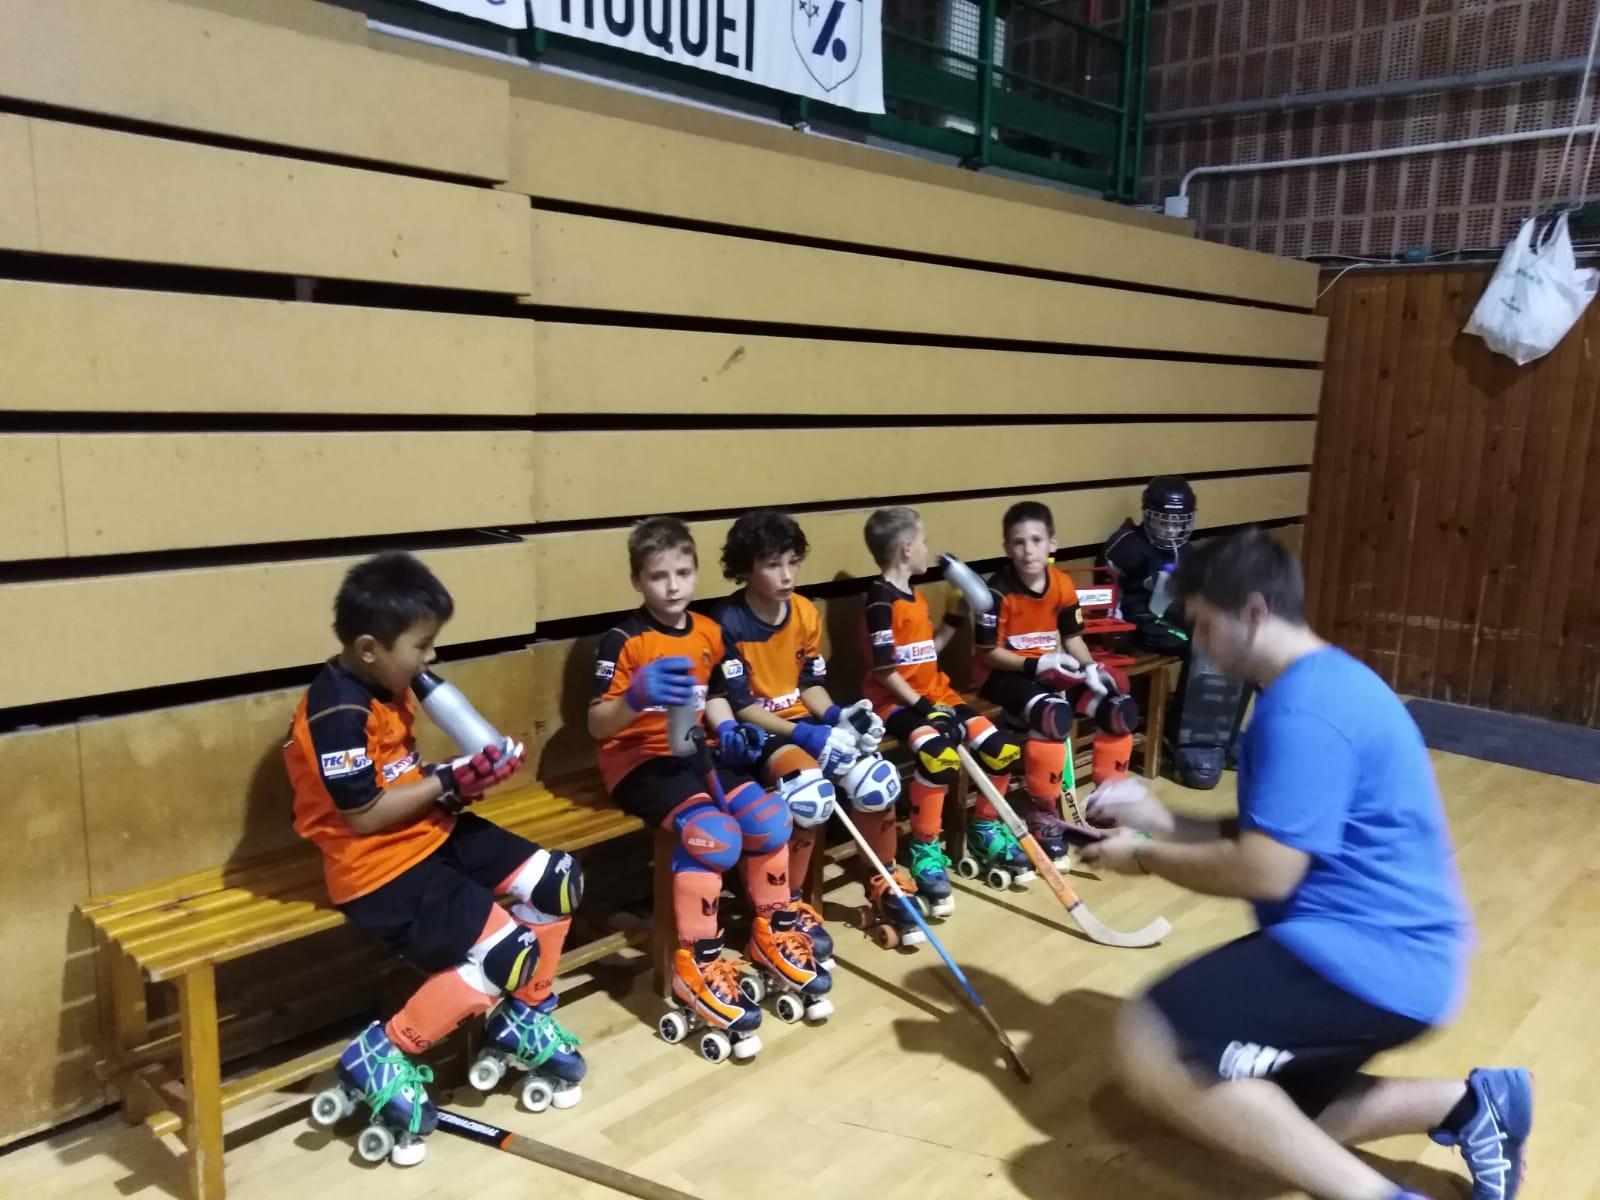 Crónica TÀRREGA HOQUEI PATINS CLUB 07-10-2018 – Jornada 3